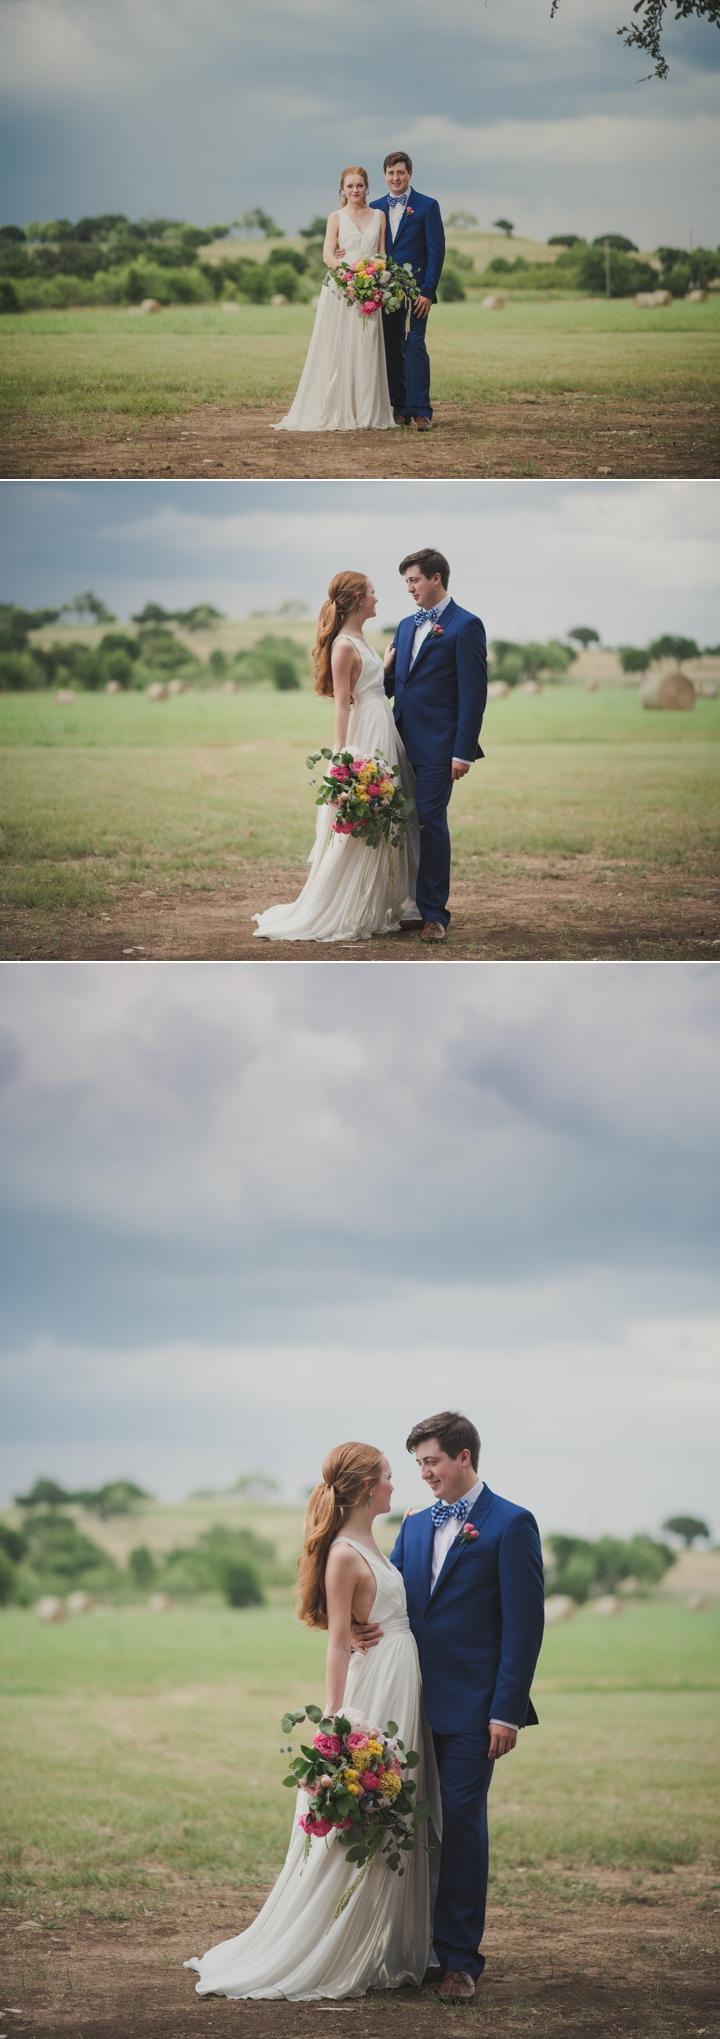 destination-wedding-photographers-ej 19.jpg